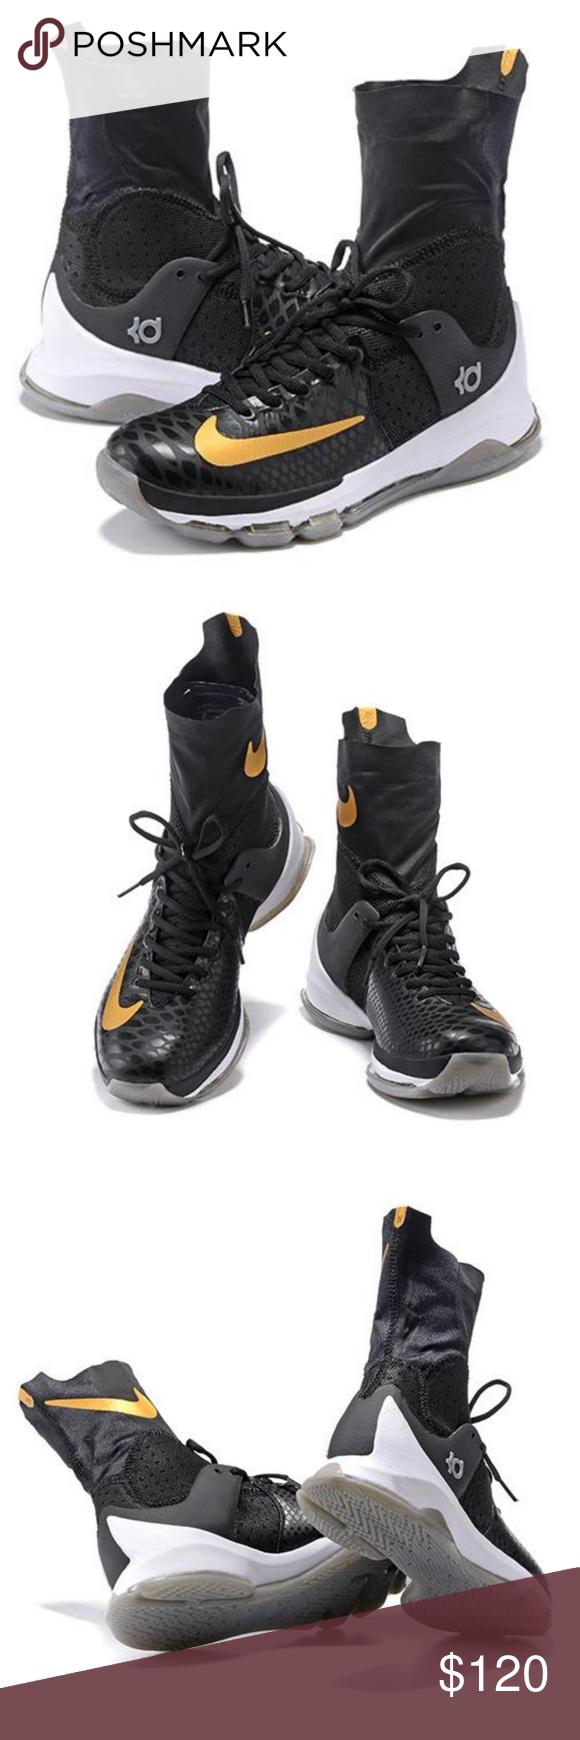 ce8959d5343a Nike KD 8 Elite VIII Away Kevin Durant Basketball Nike KD 8 Elite Black  Metallic